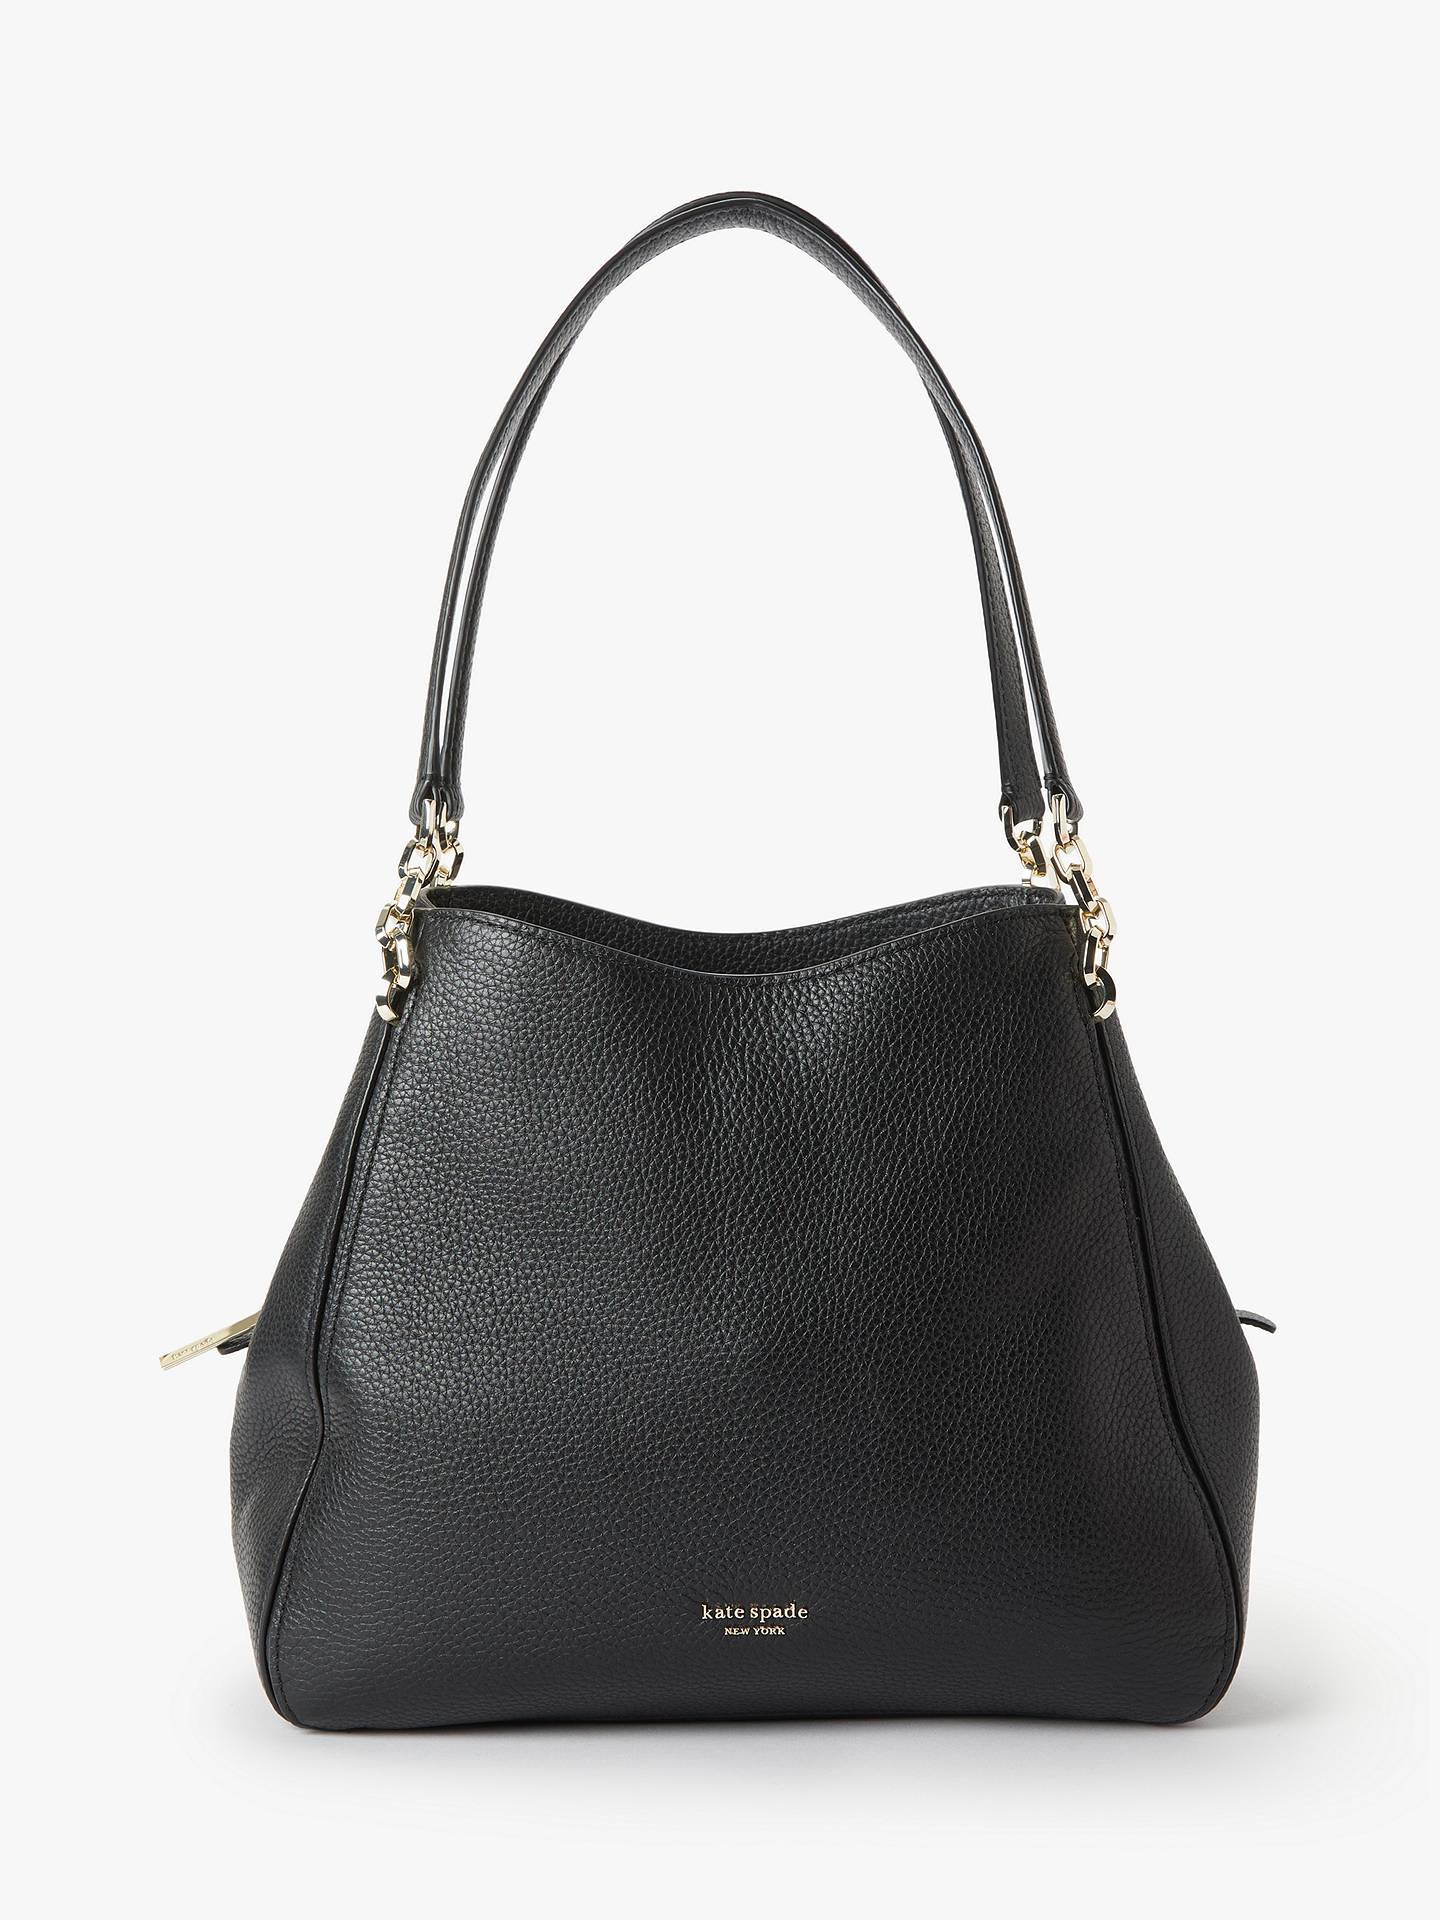 c42335fd56df Buy kate spade new york Hailey Medium Leather Shoulder Bag, Black Online at  johnlewis.